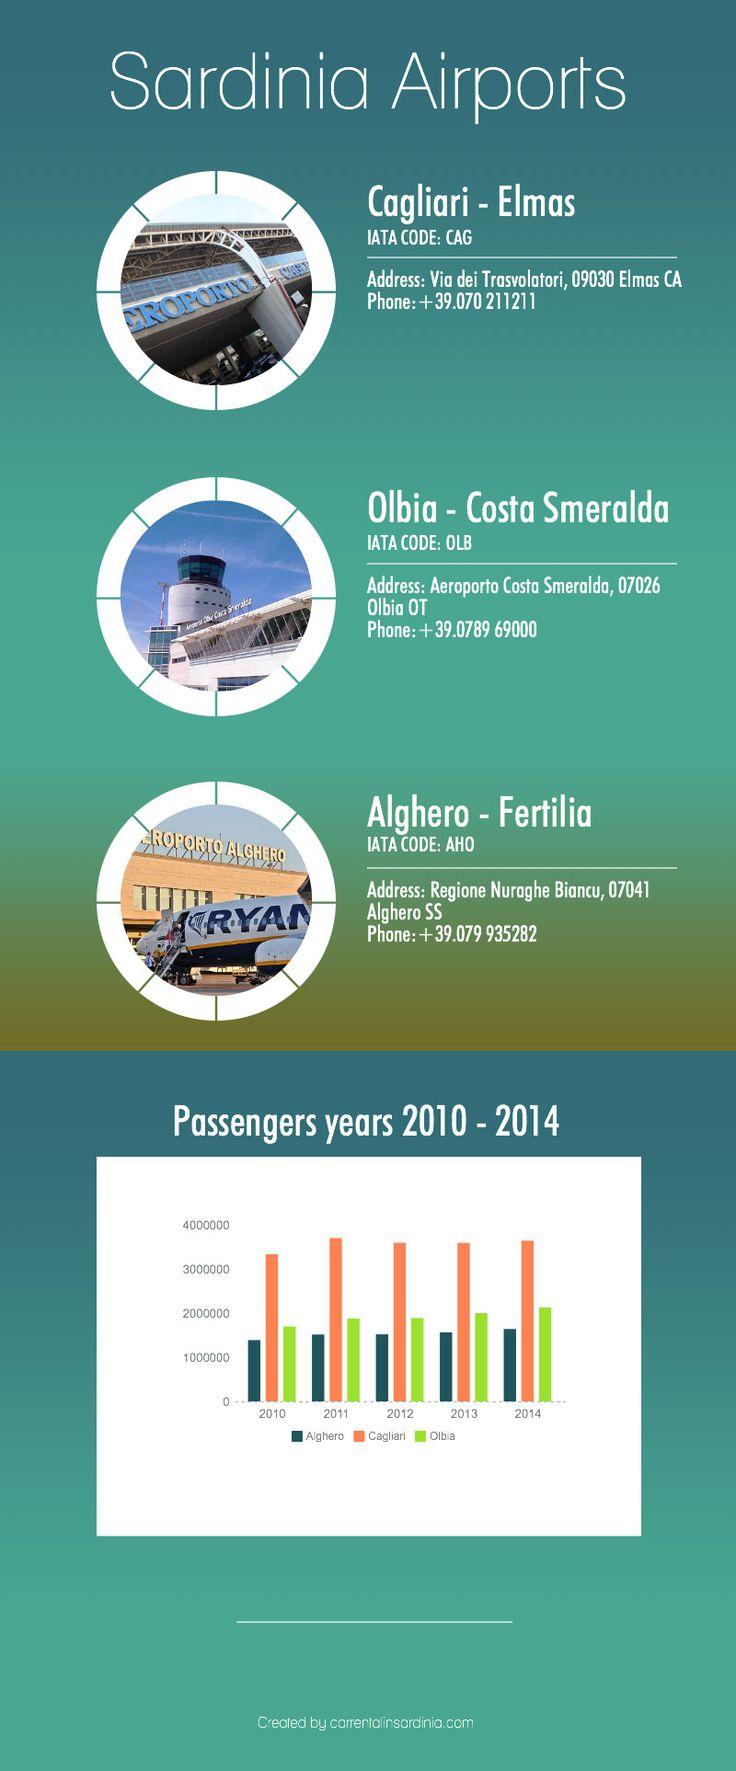 sardinia airports infographic